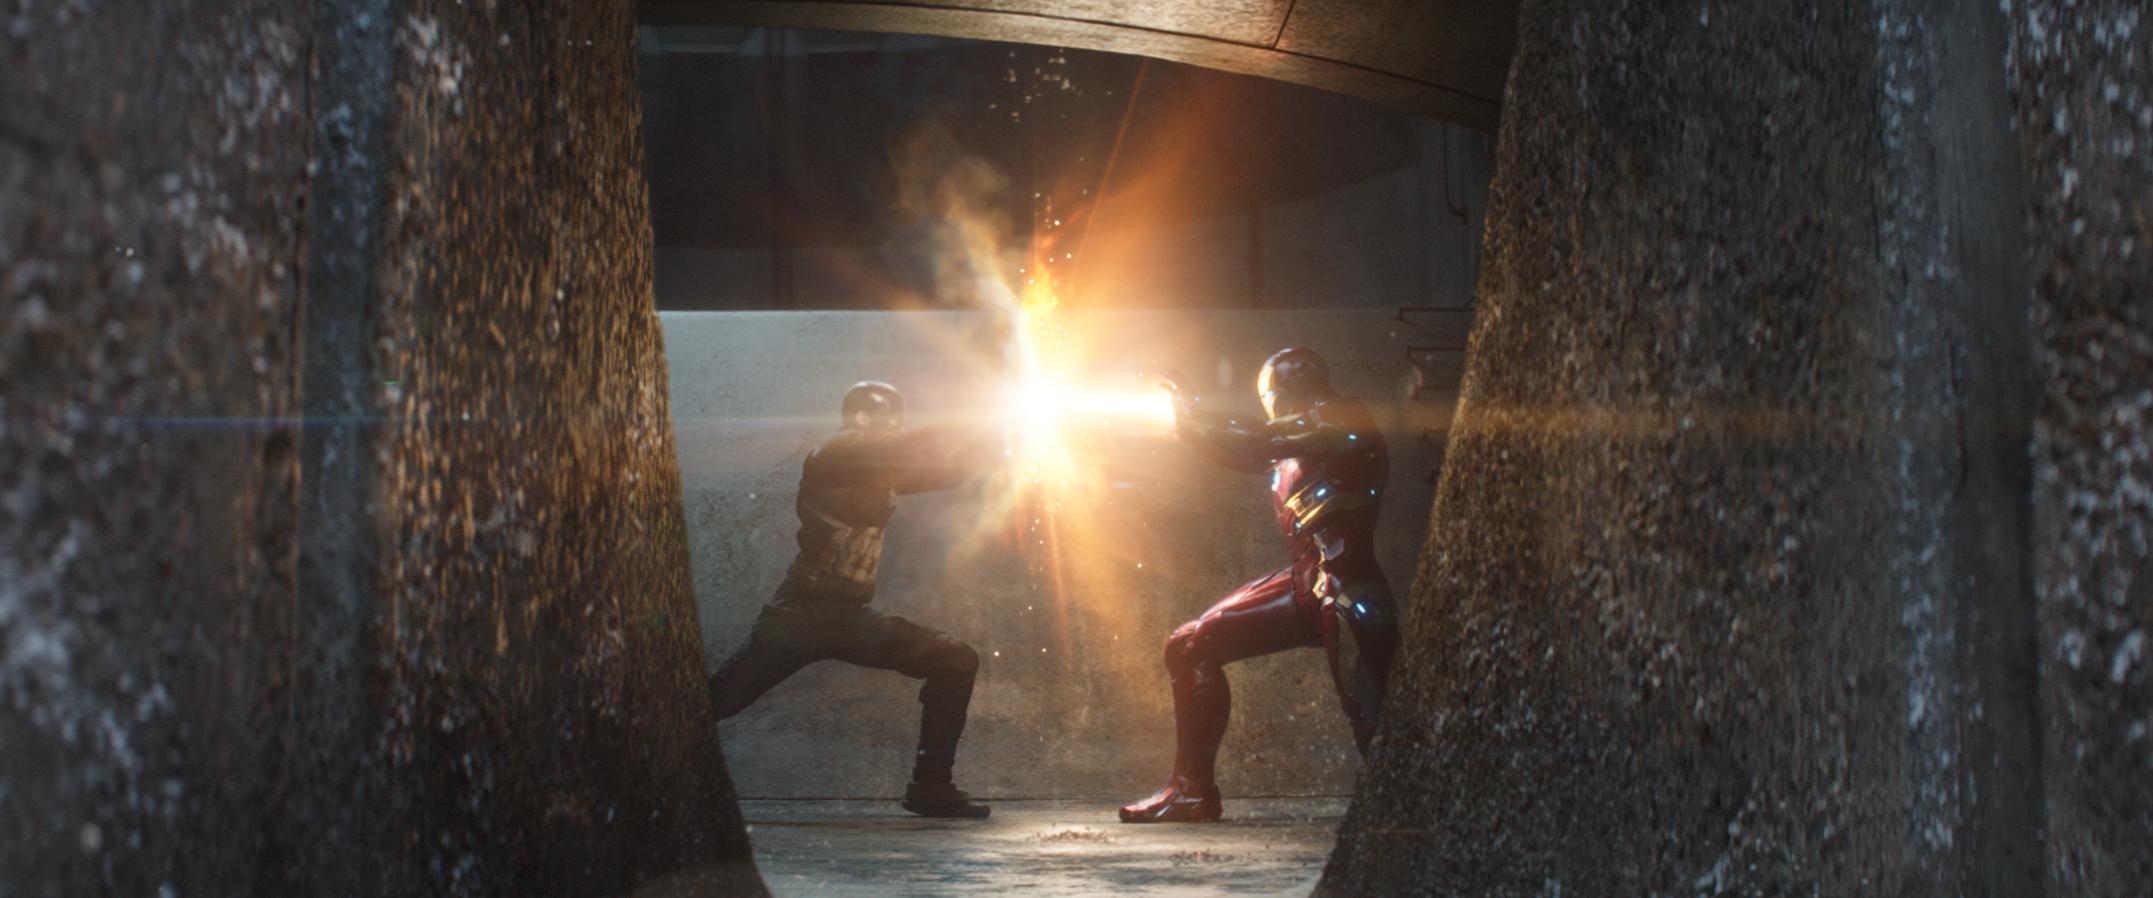 Resultado de imagem para captain america versus iron man civil war